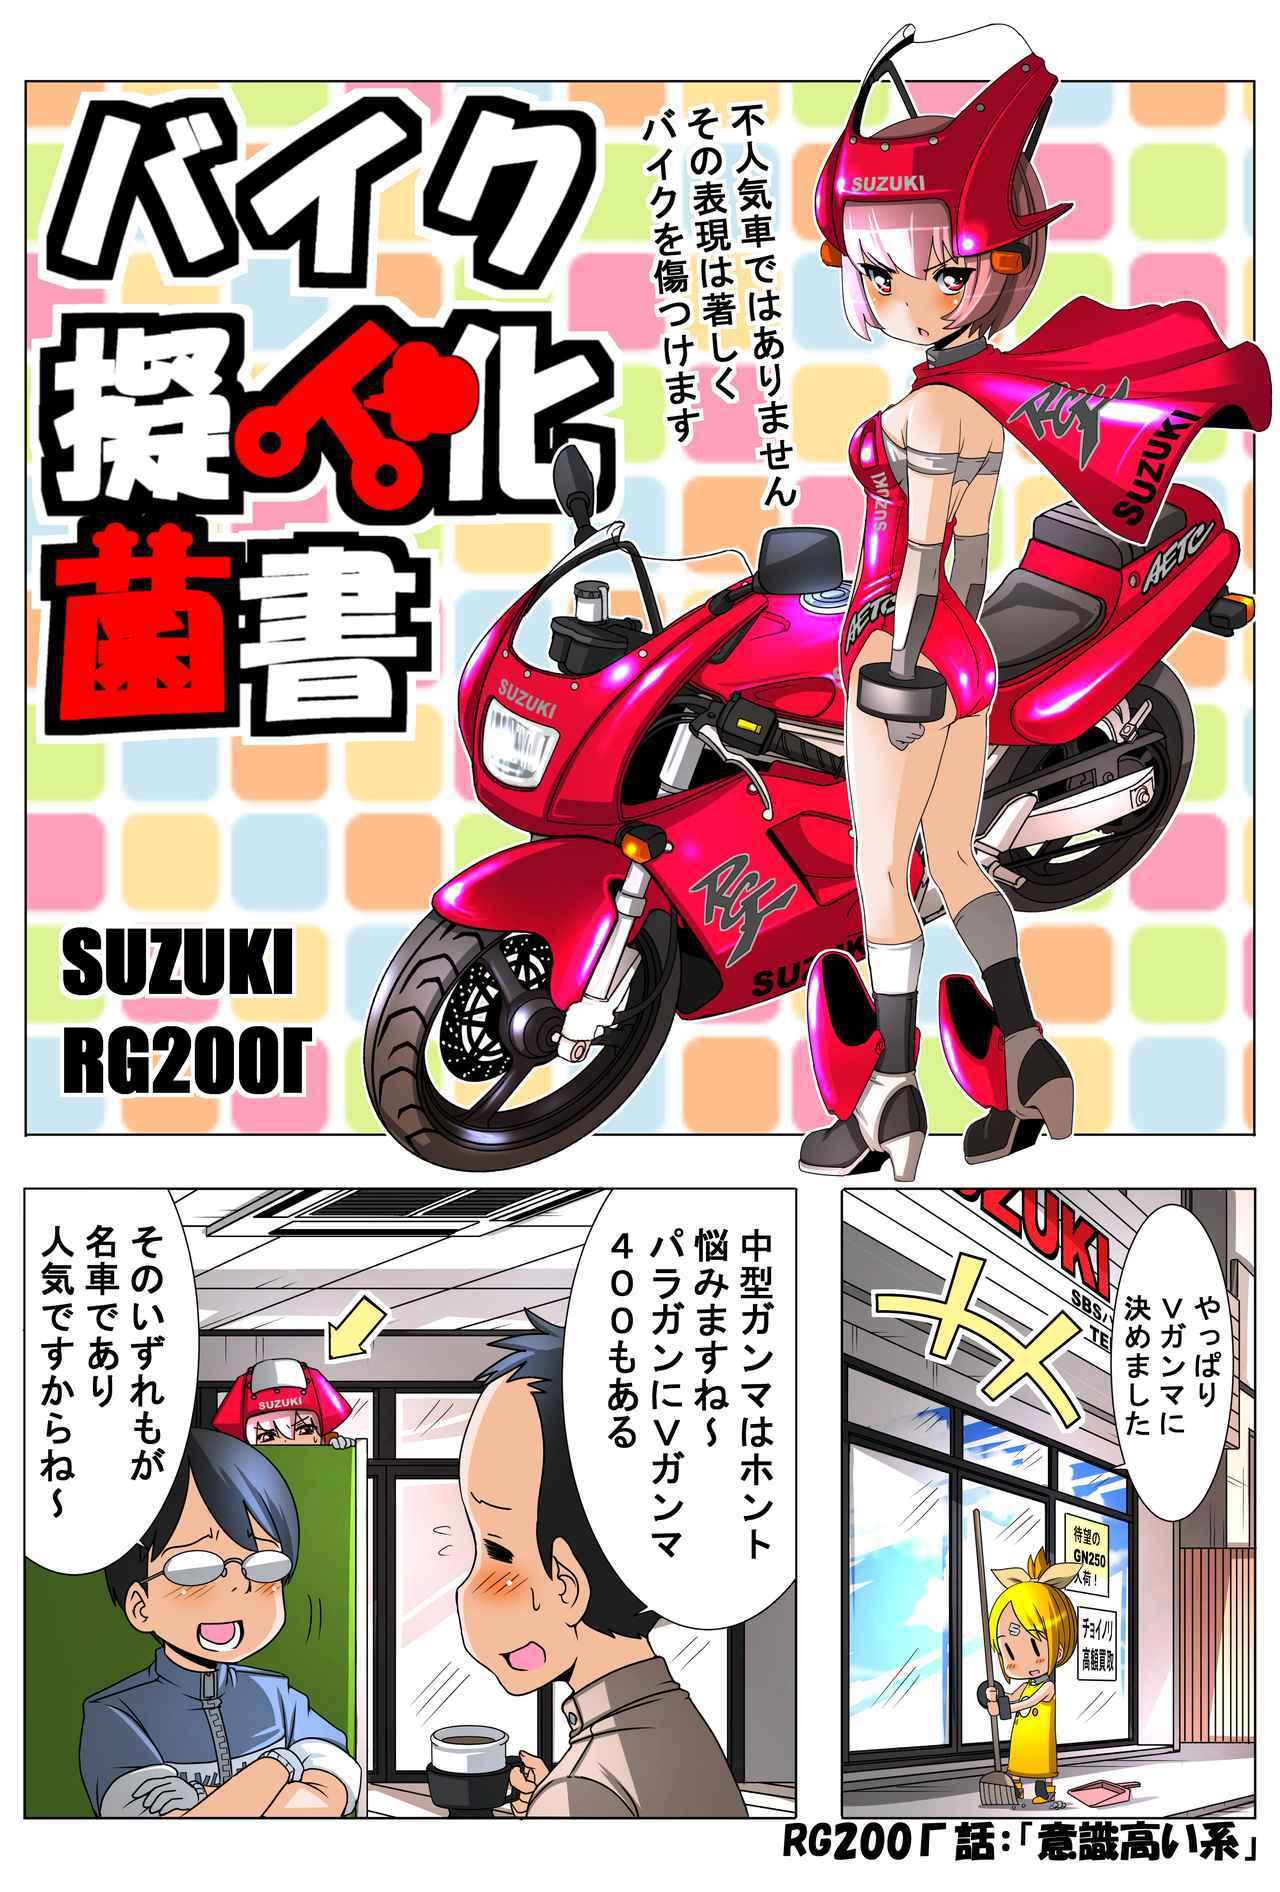 画像1: 『バイク擬人化菌書』RG200Γ 話「意識高い系」 作:鈴木秀吉